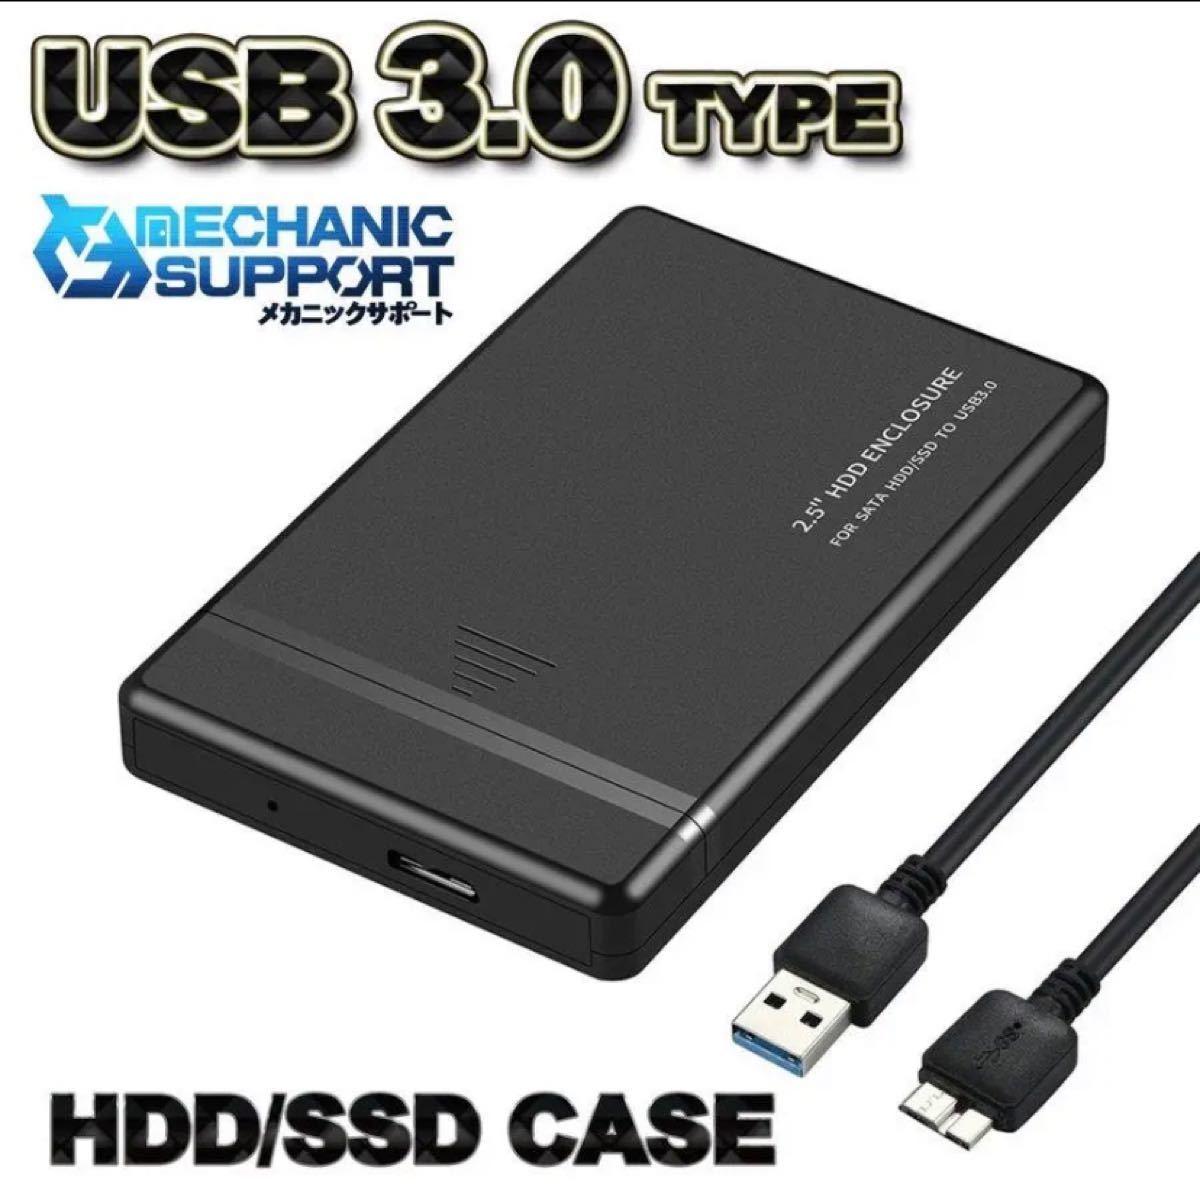 【USB 3.0】高品質 2.5インチ HDD/SSD ケース 接続 黒